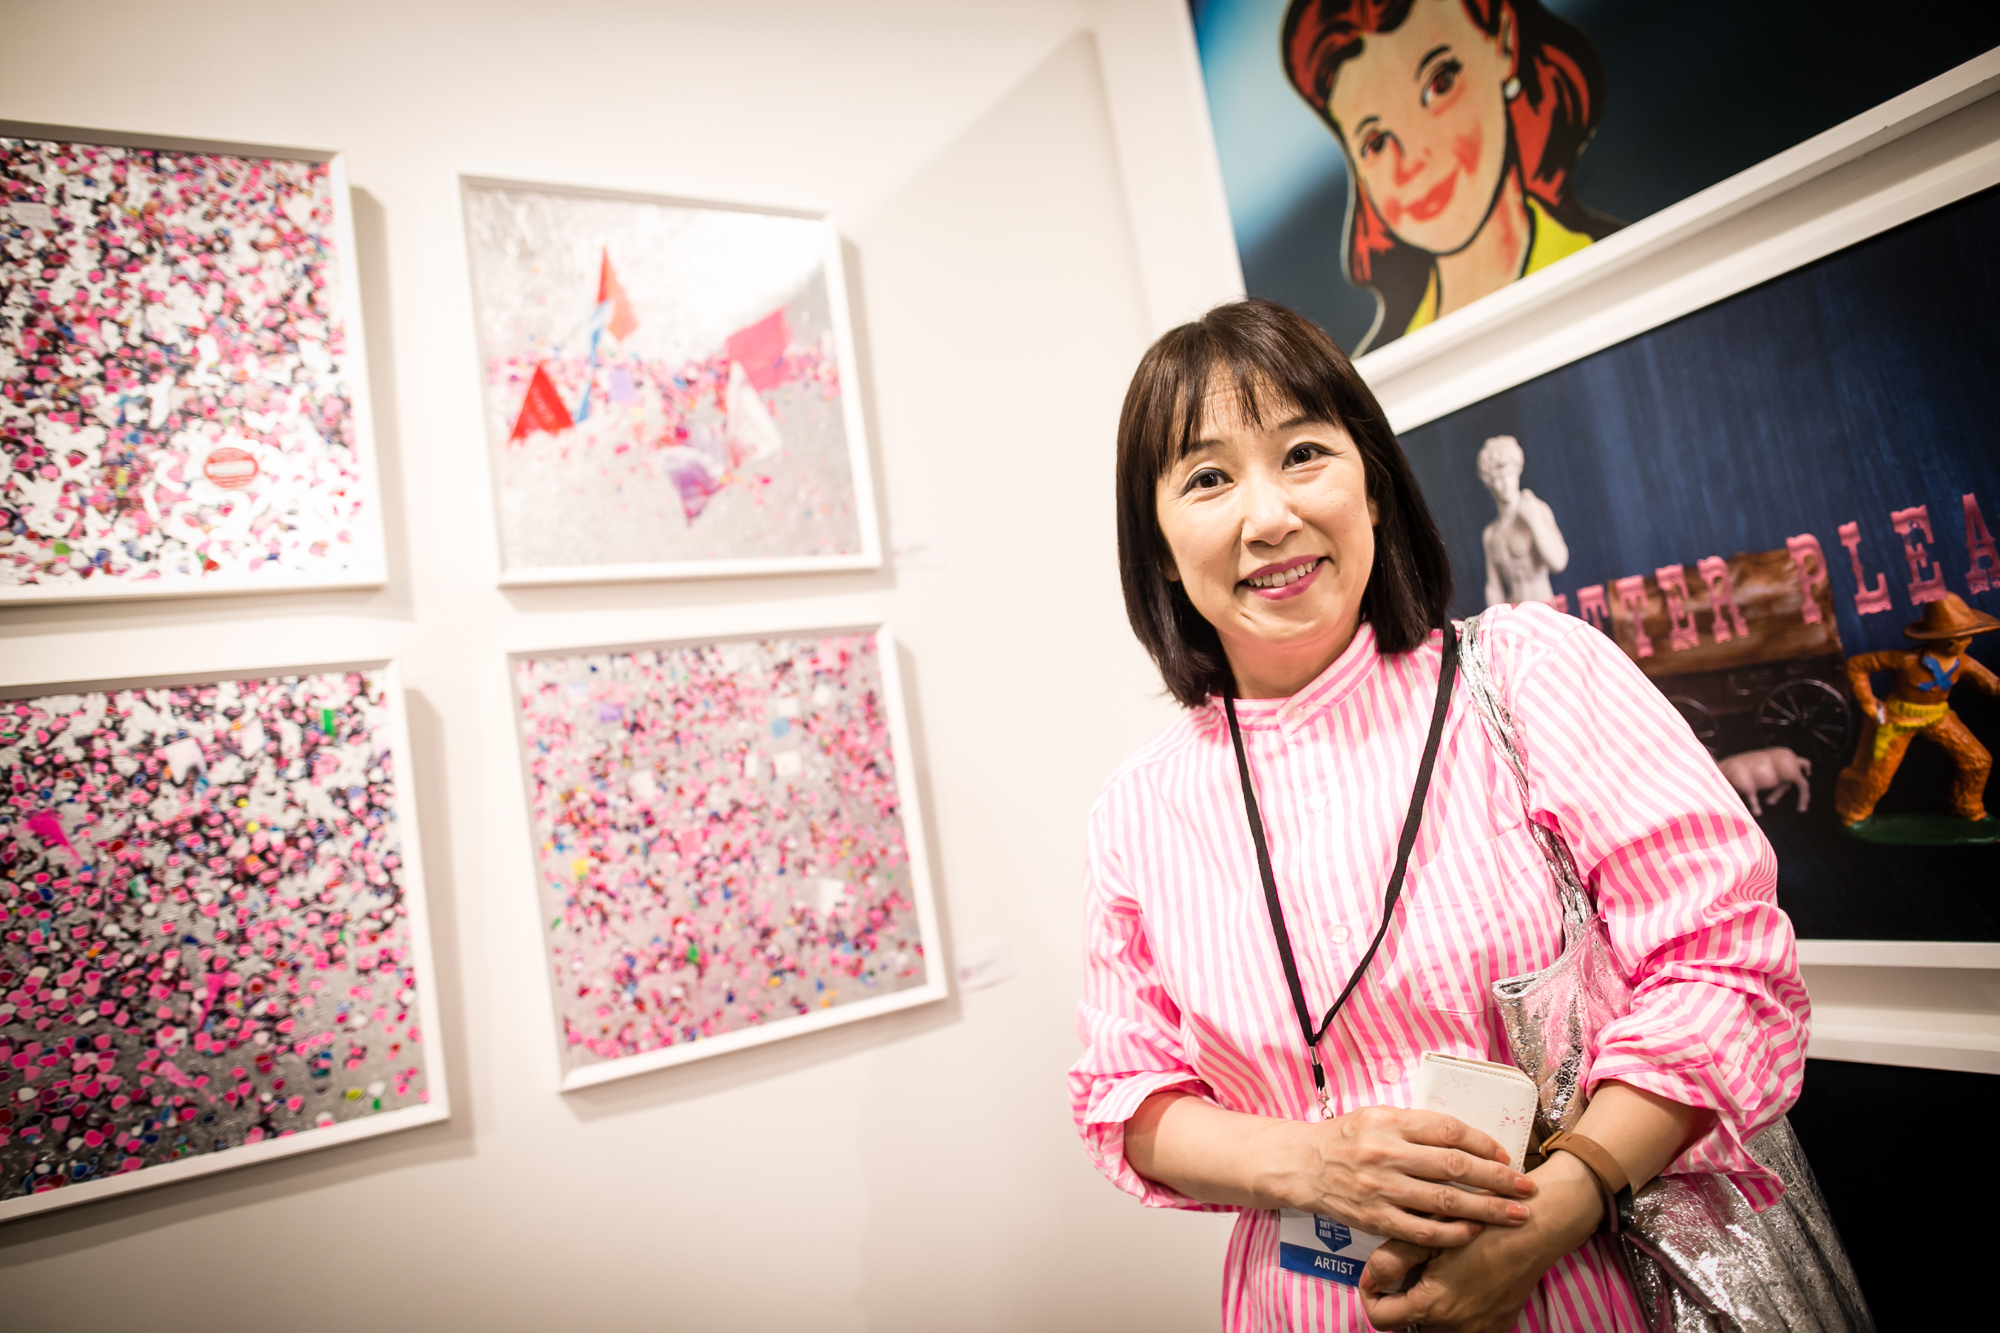 Artist Yumiko Hirokawa